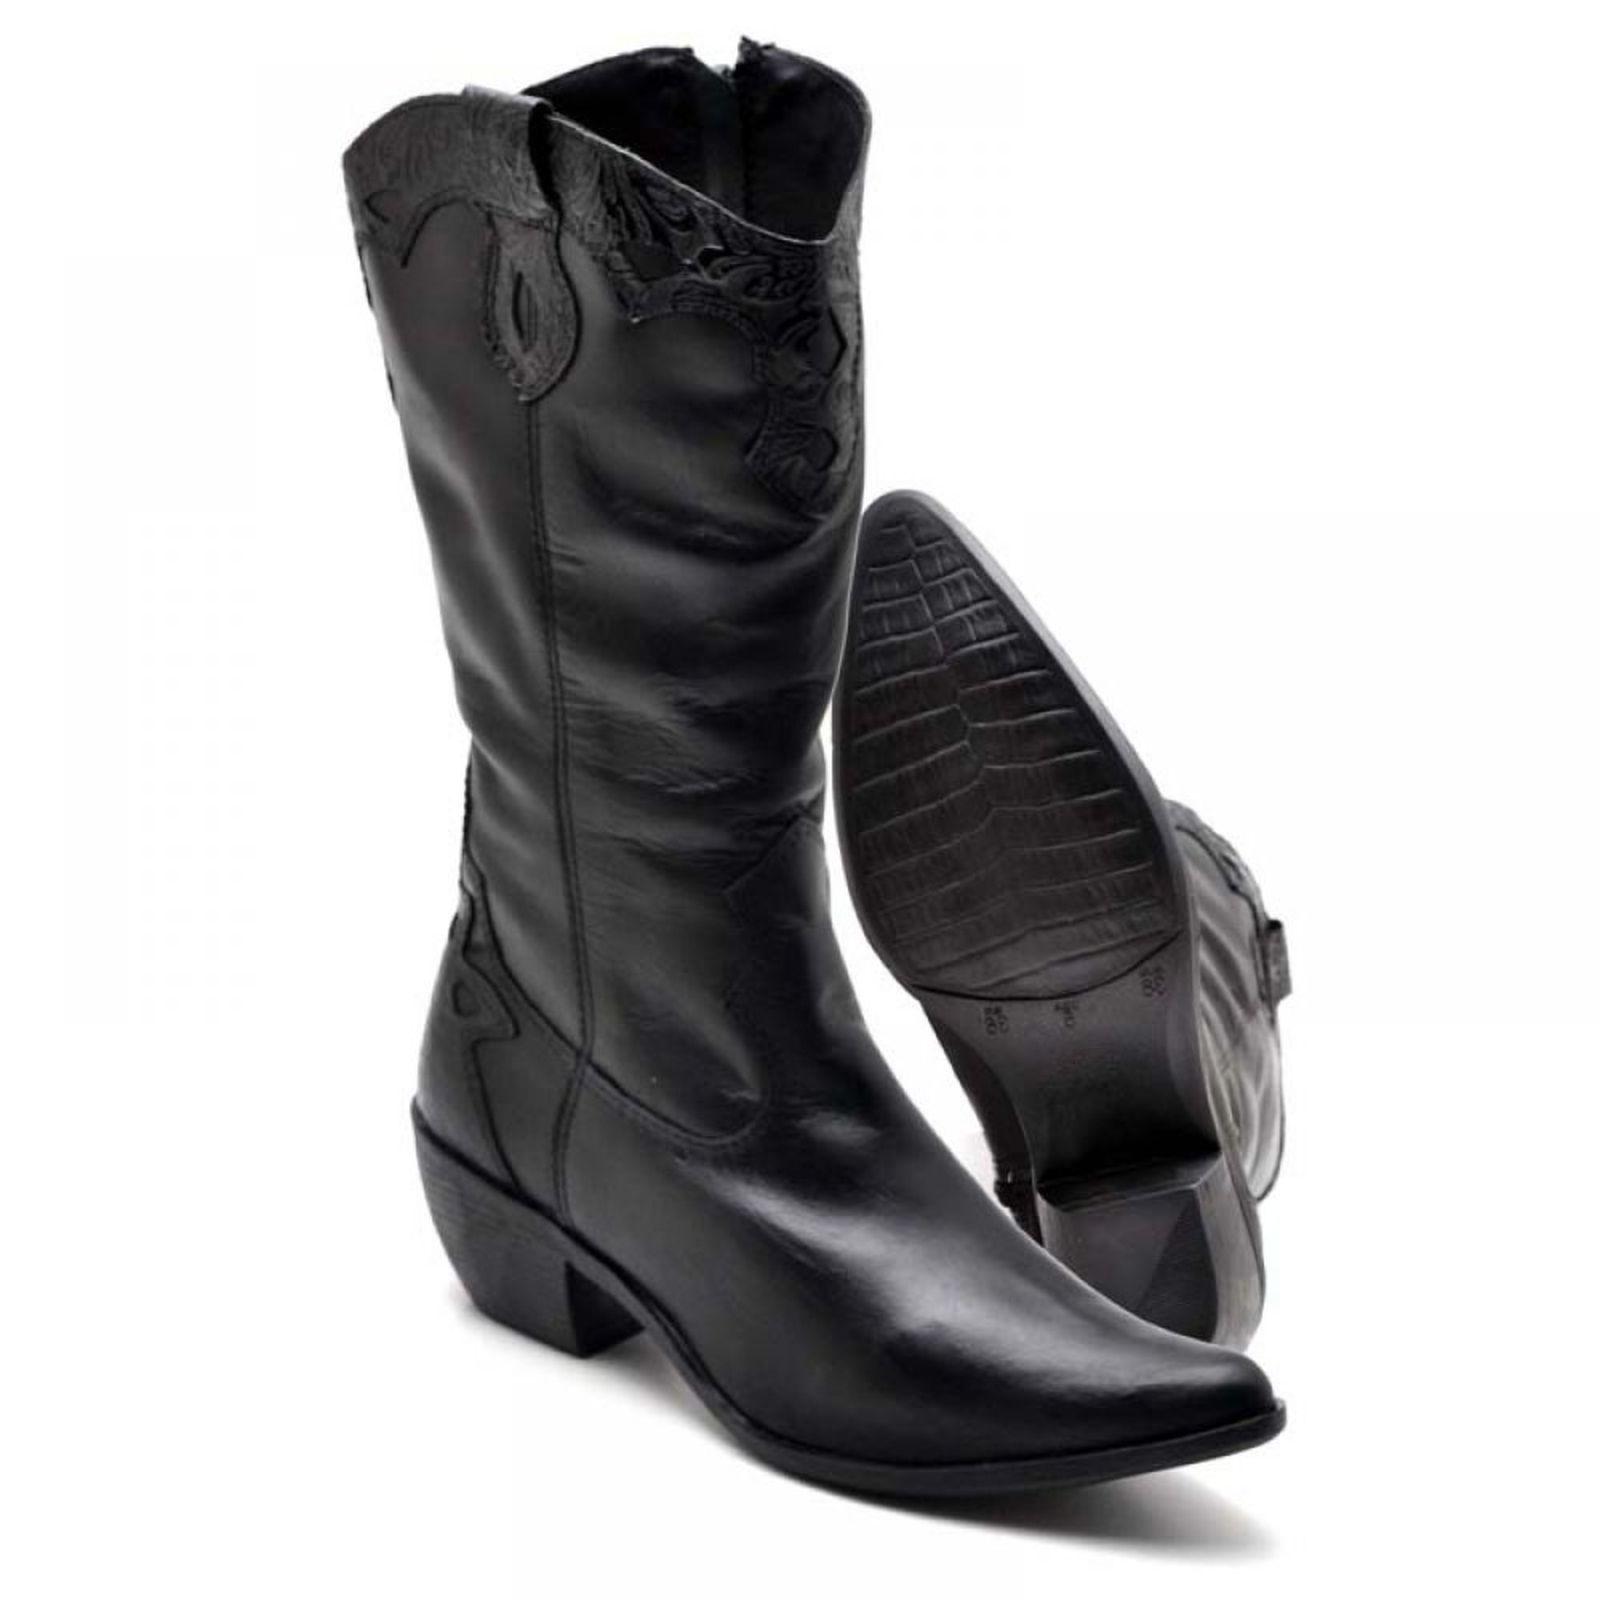 Bota Country Bico Fino Top Franca Shoes Preto | Botas